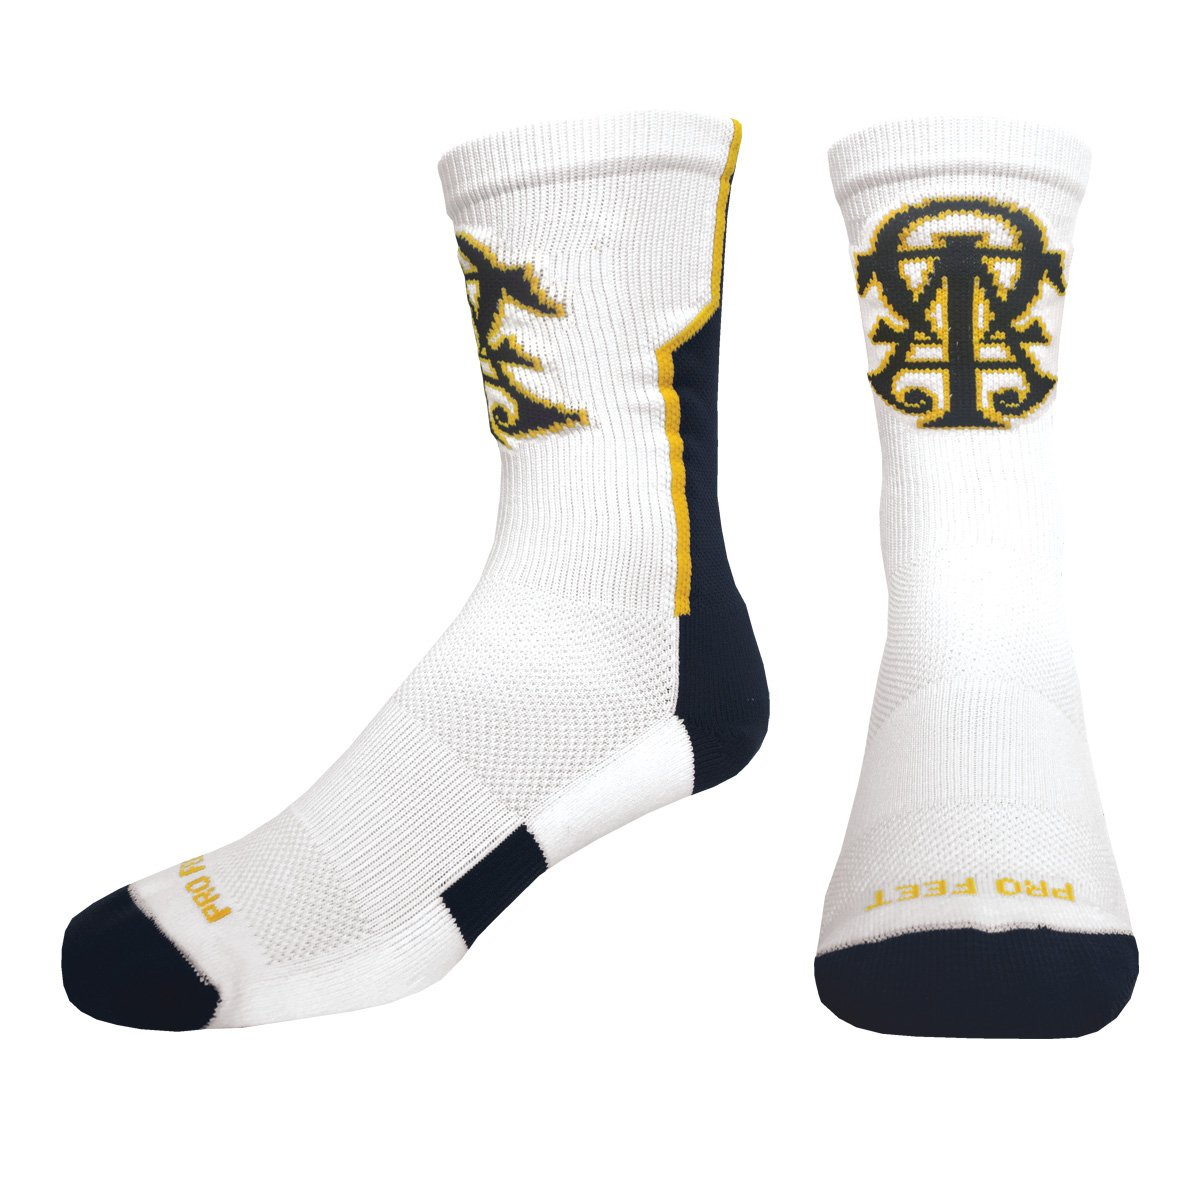 ATO White Performance Socks